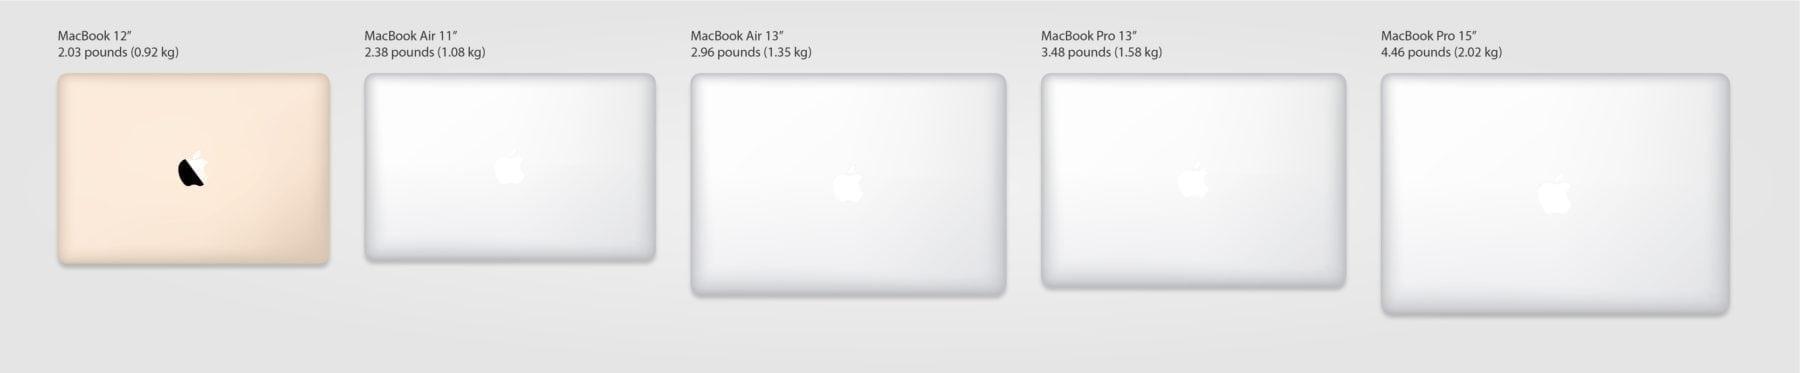 horiztonal size comparison of all 2015 macbooks